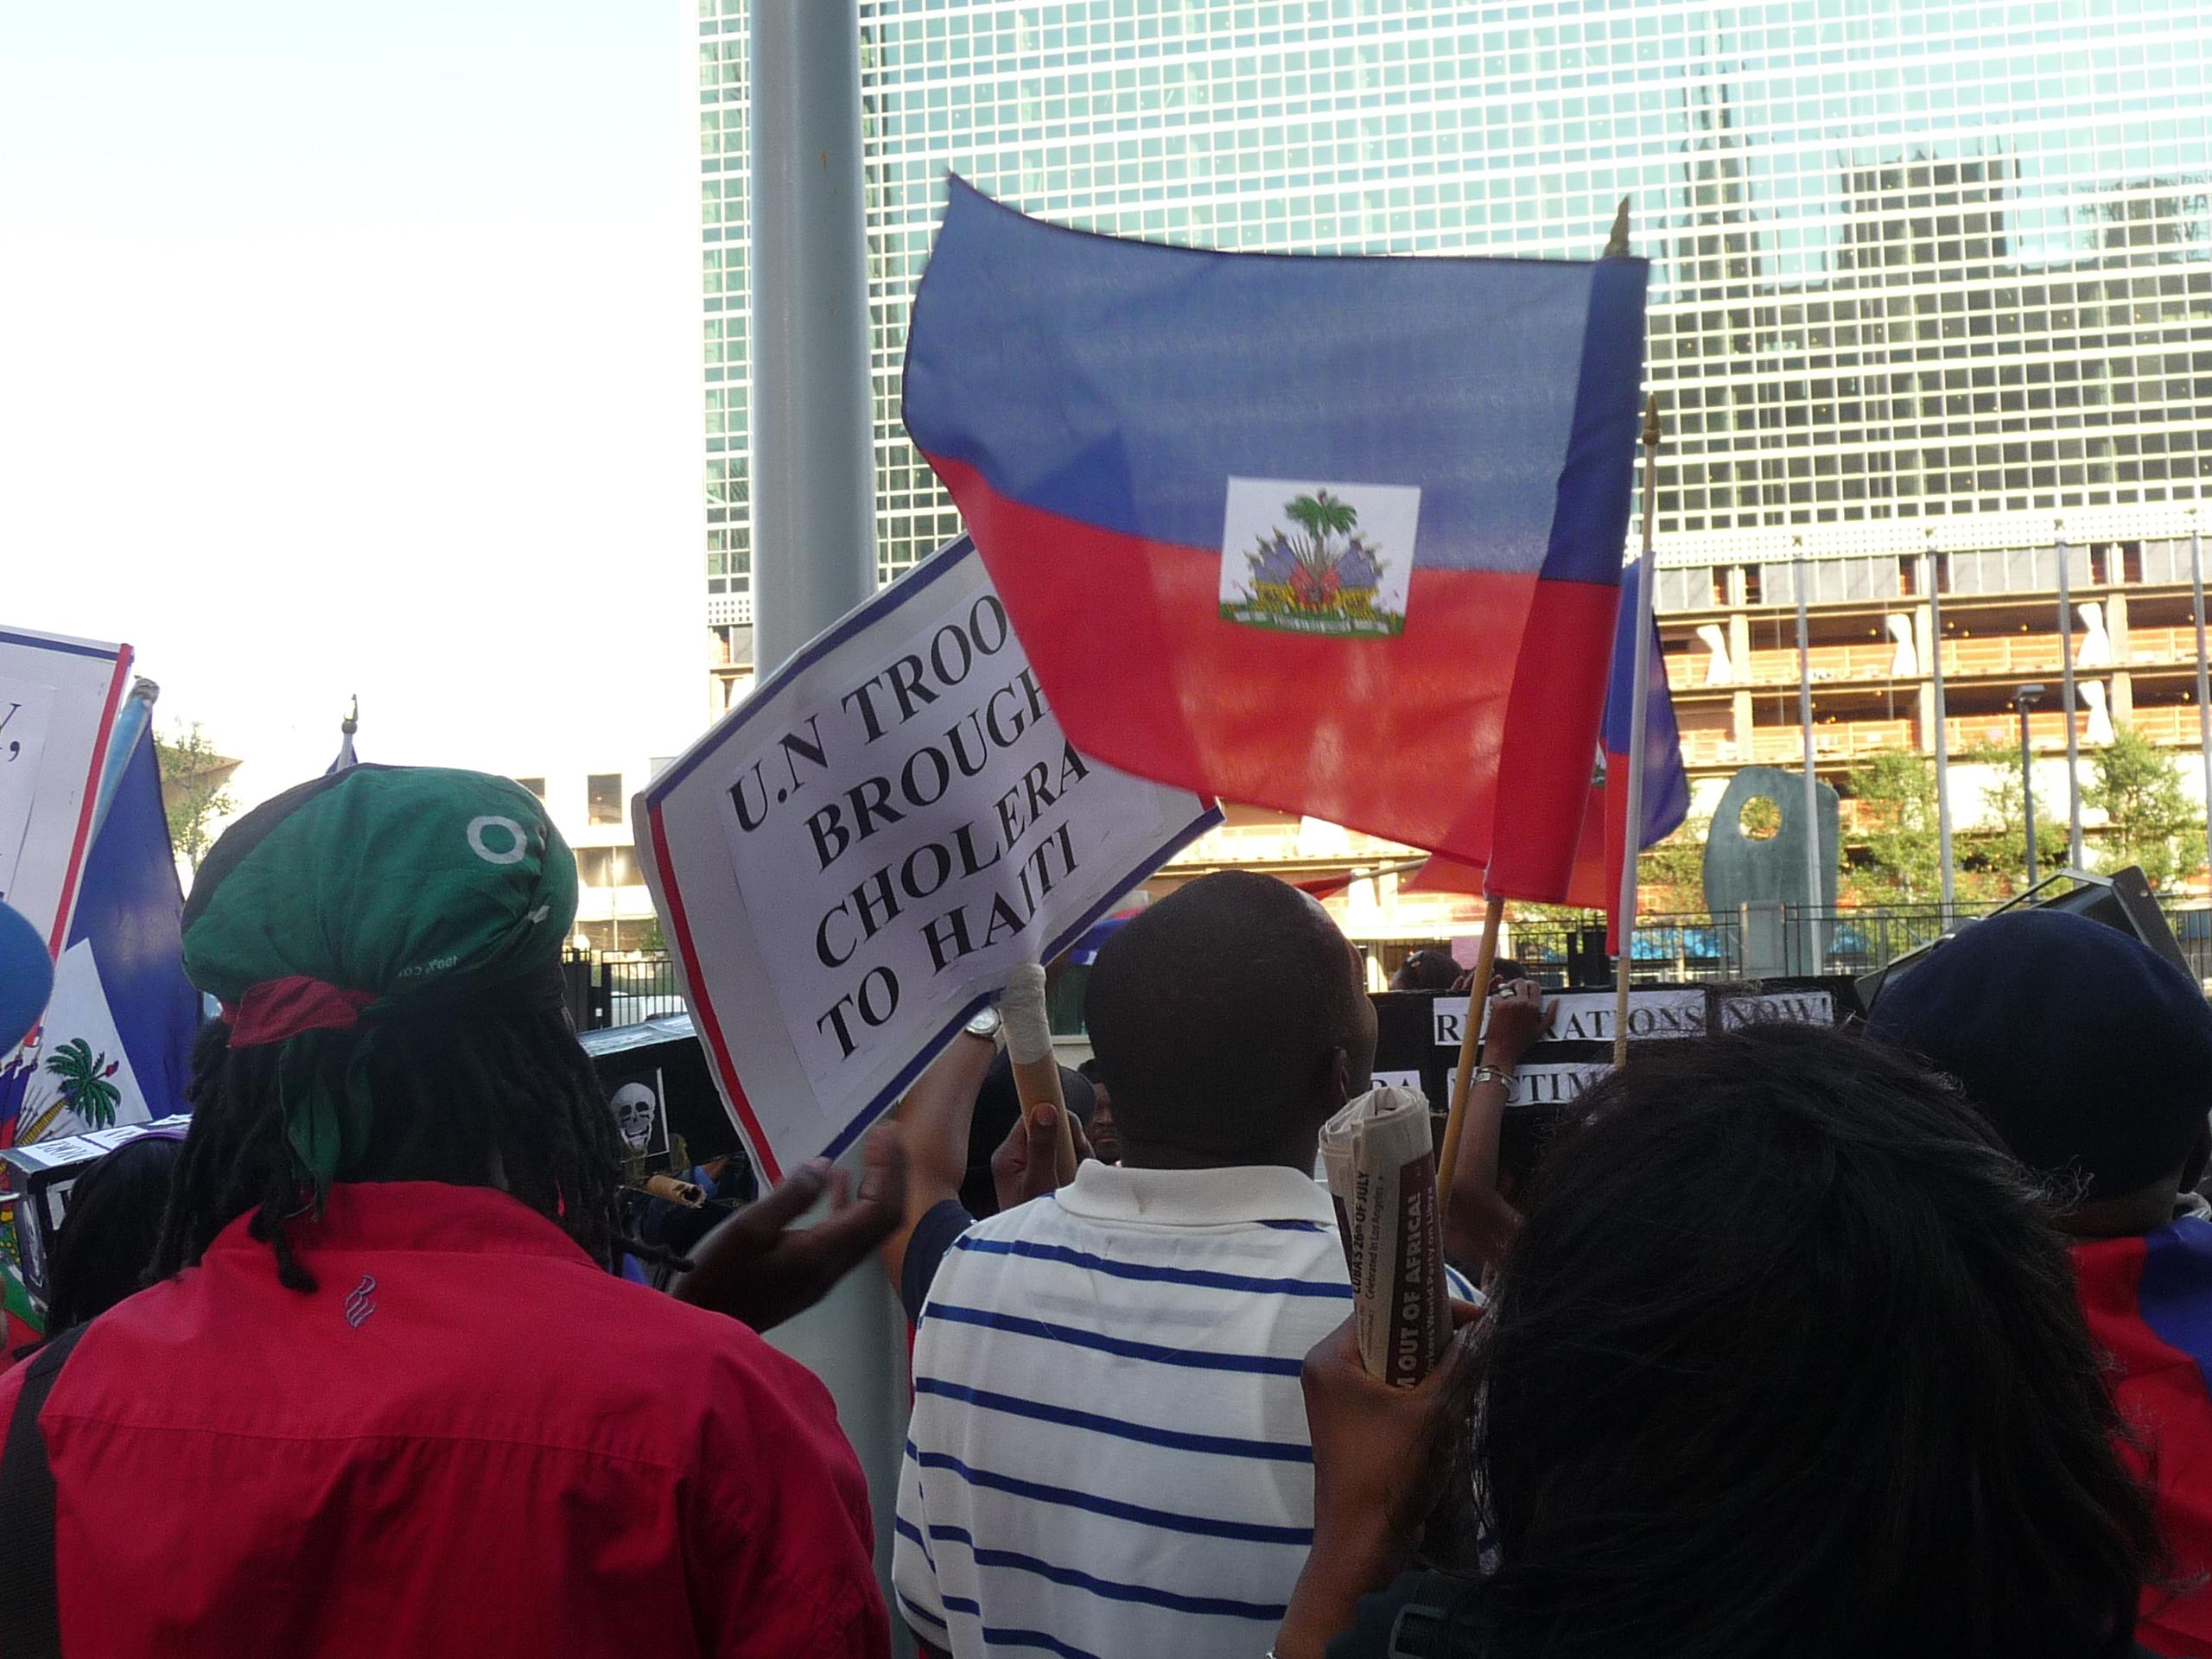 20110805_demo-against-un-occupation-cholera-in-haiti_36